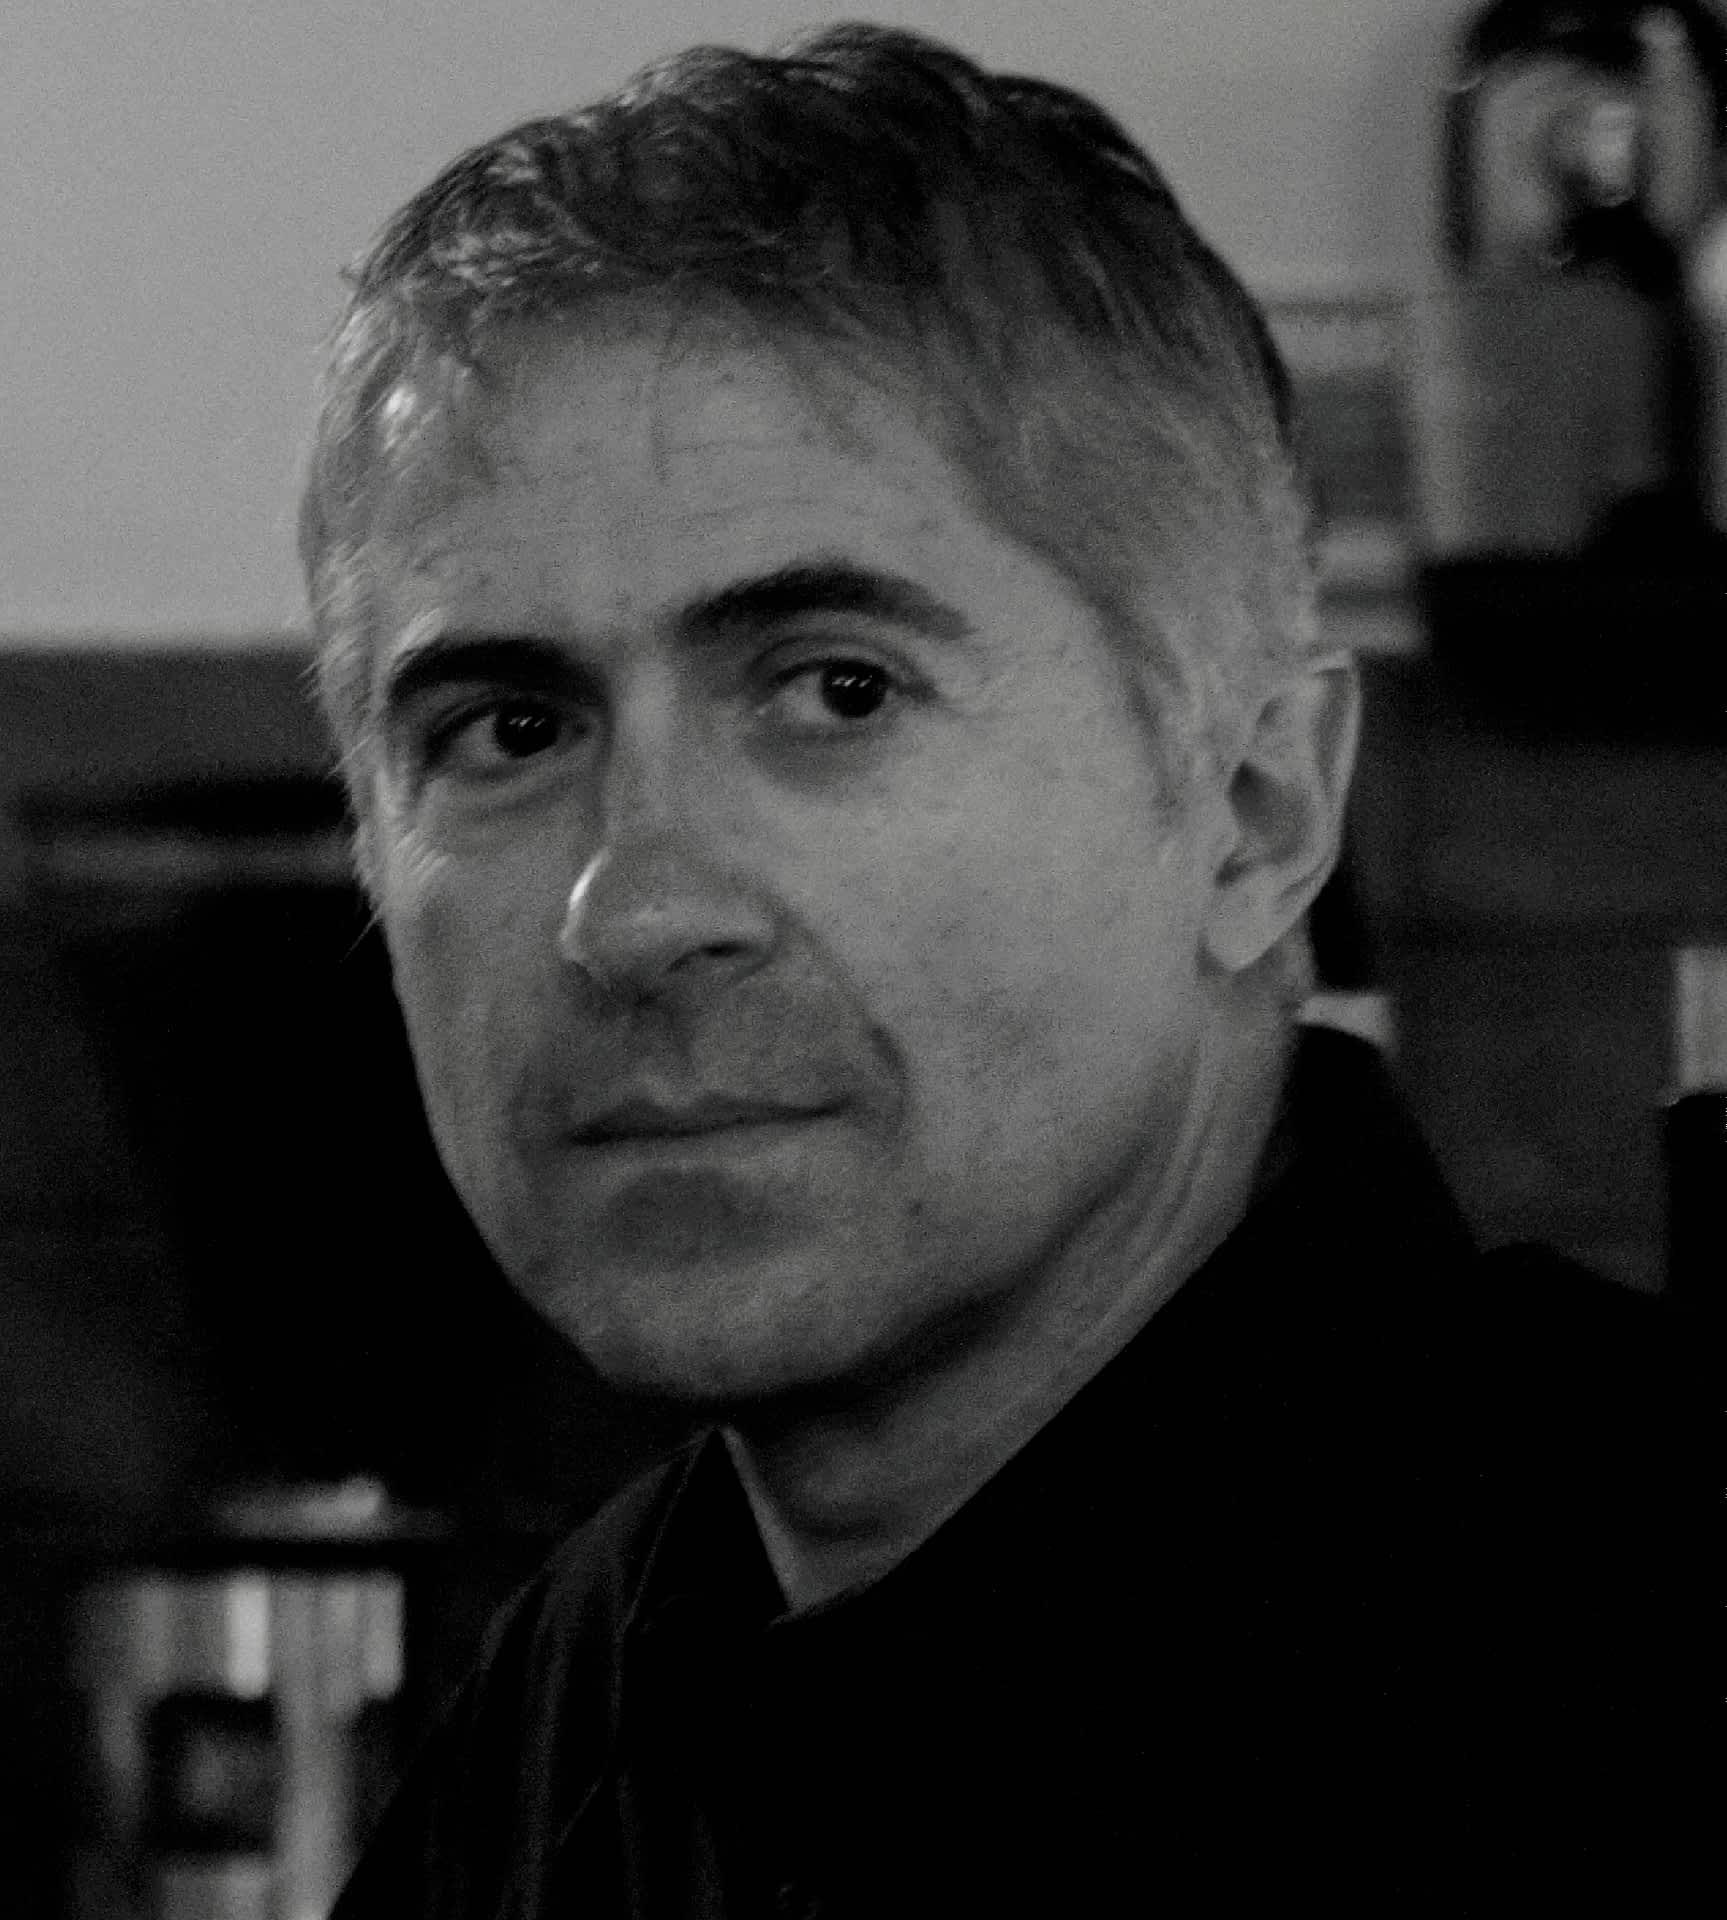 Stefano Mazzesi